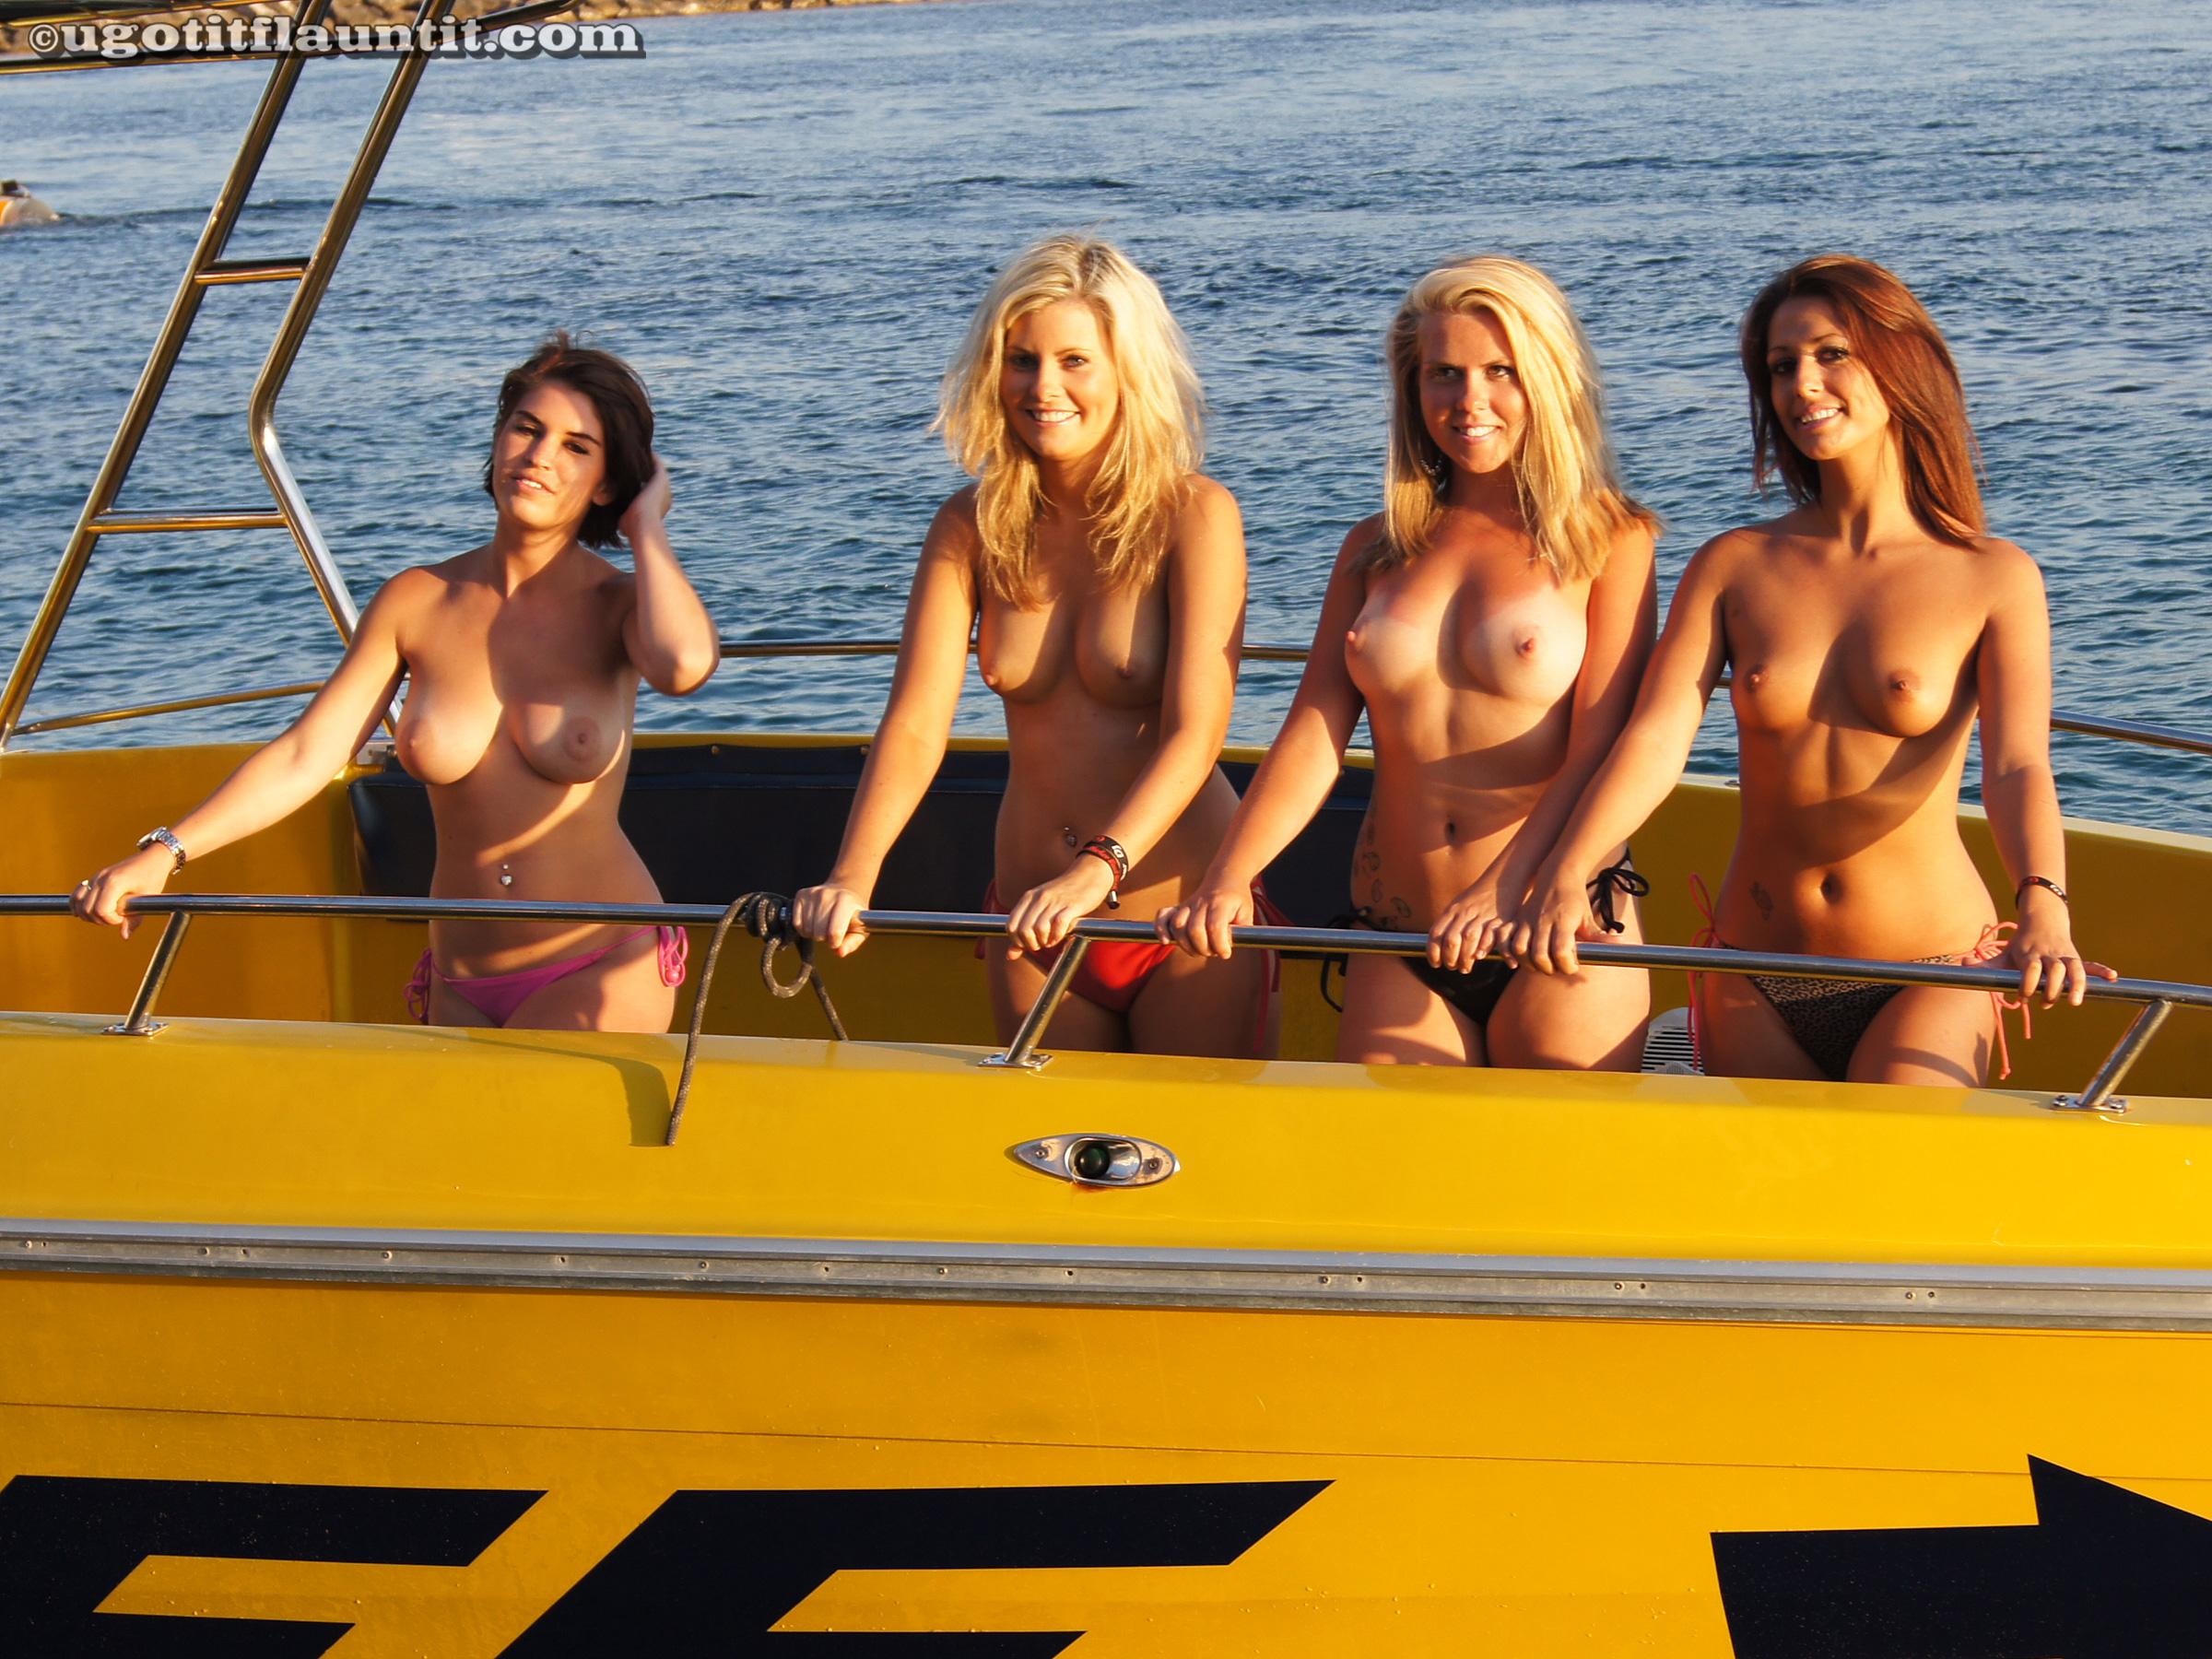 San antonio boat cruise stacey - 1 part 5